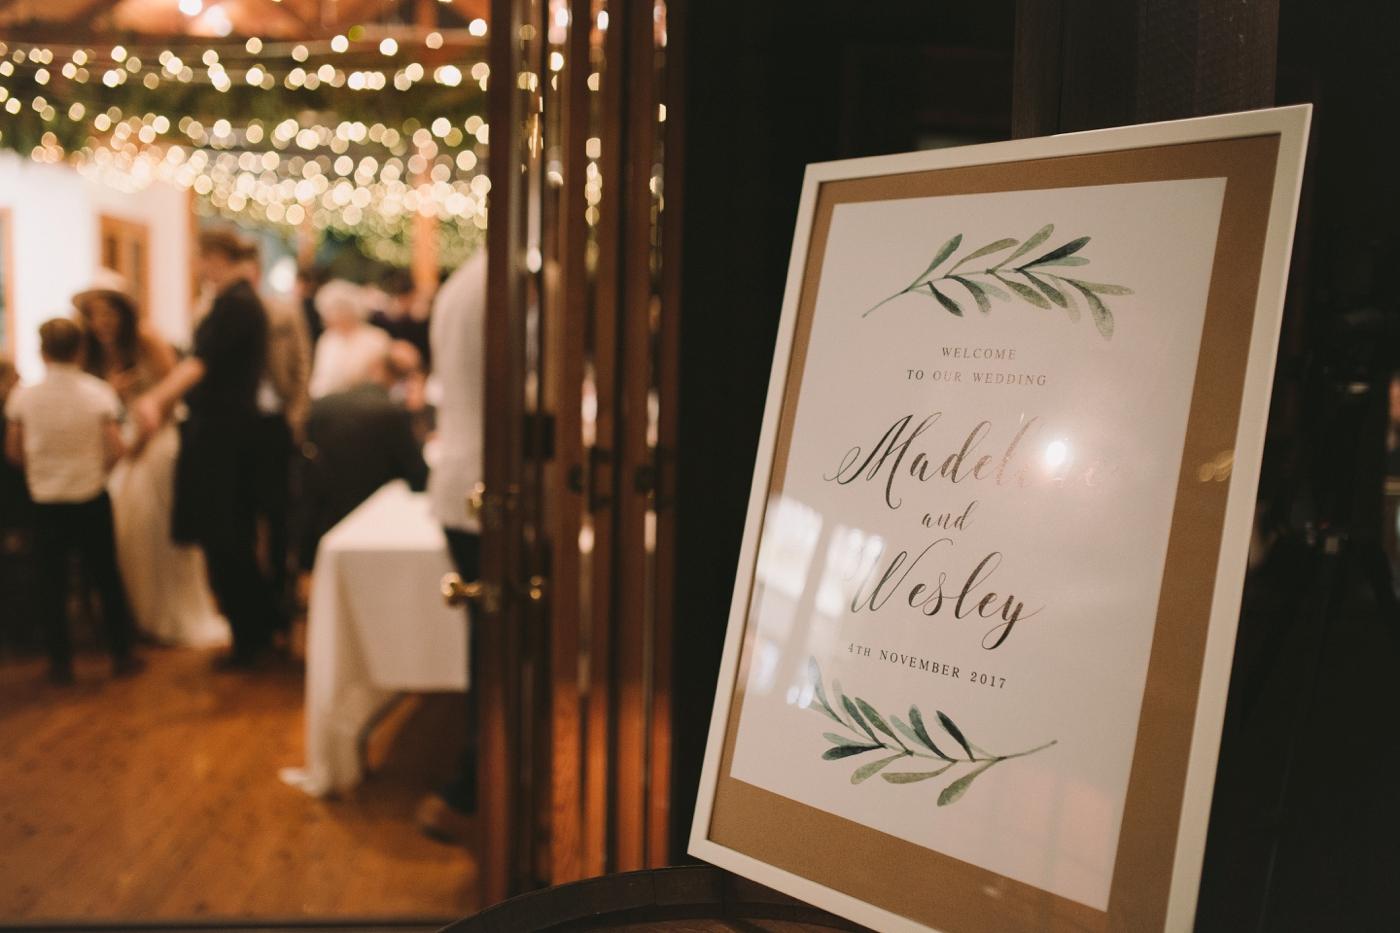 Maddy & Wes - K1 by Geoff Hardy Wedding - Adelaide Wedding Photographer - Natural wedding photography in Adelaide - Katherine Schultz_0078.jpg